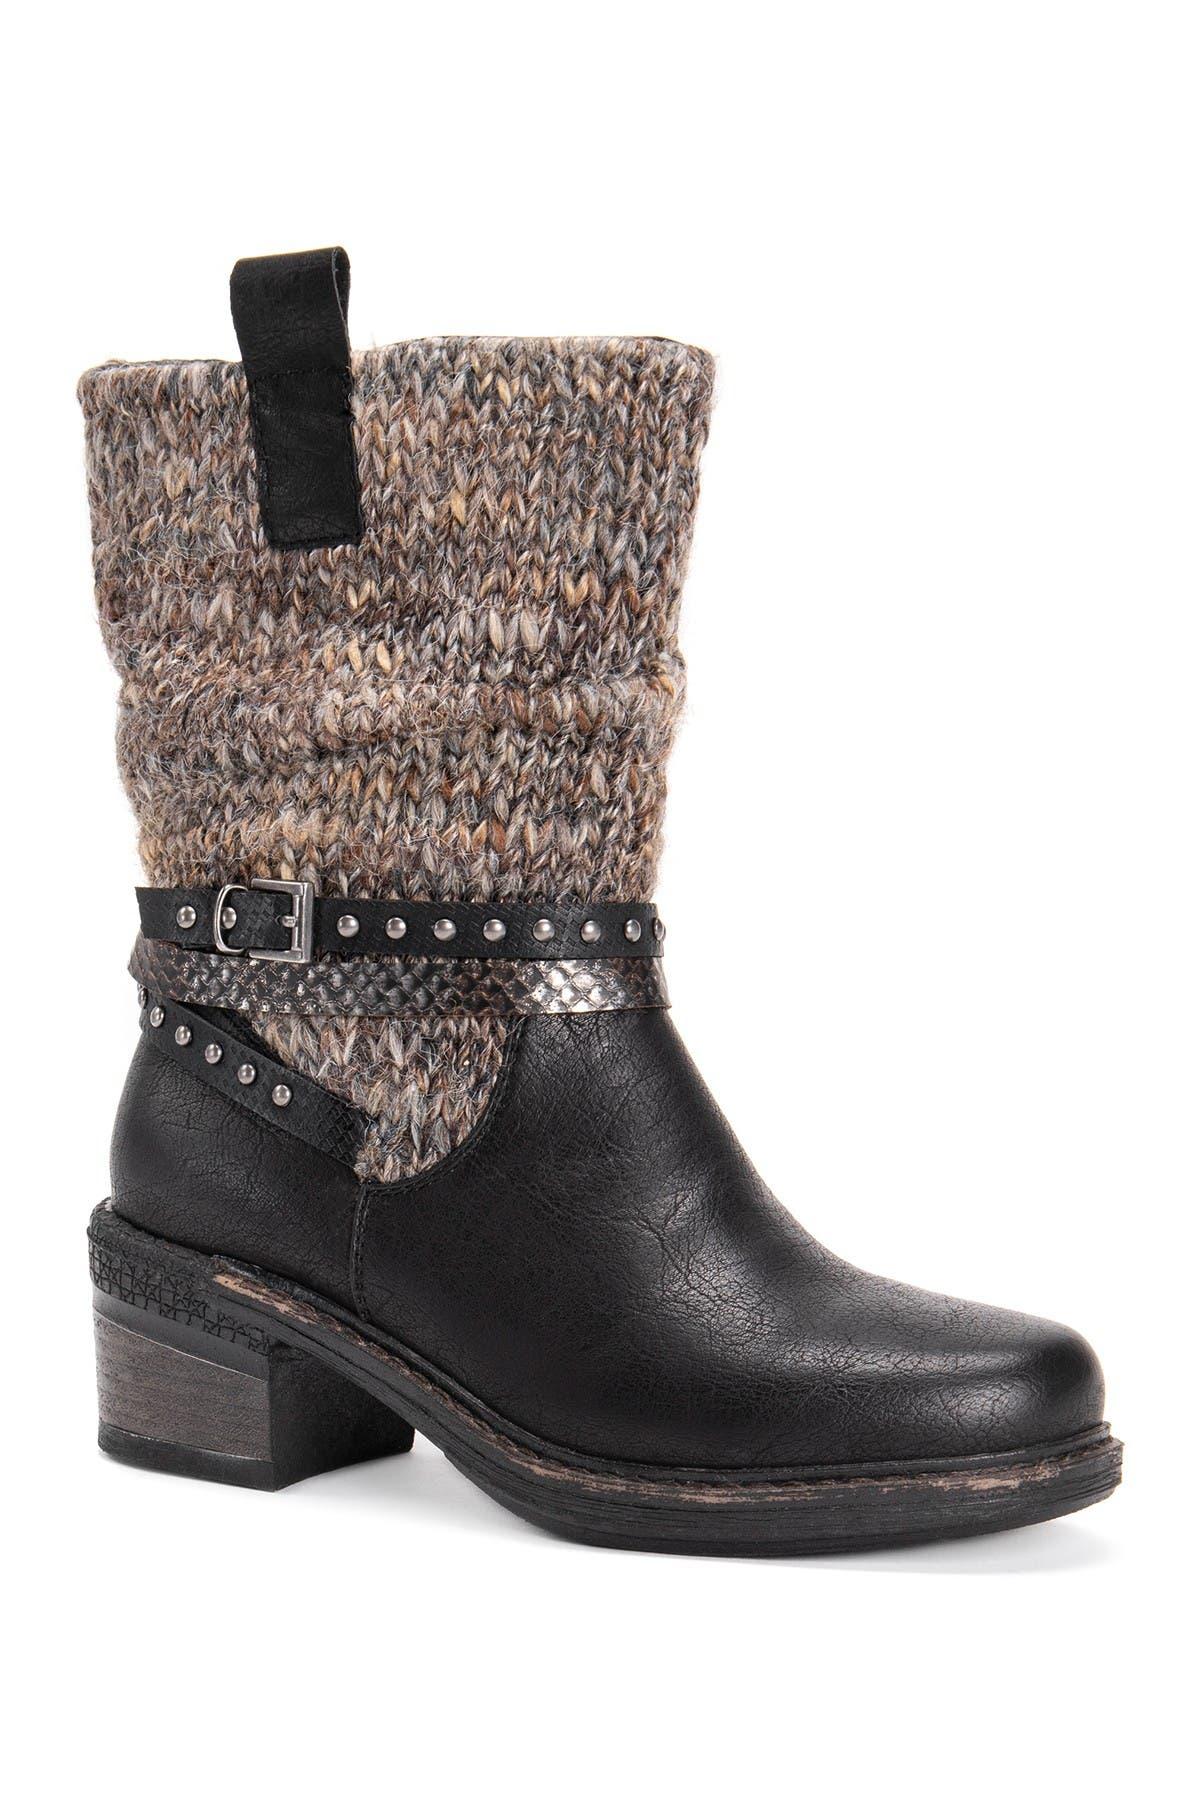 Image of MUK LUKS Kim Block Heel Boot